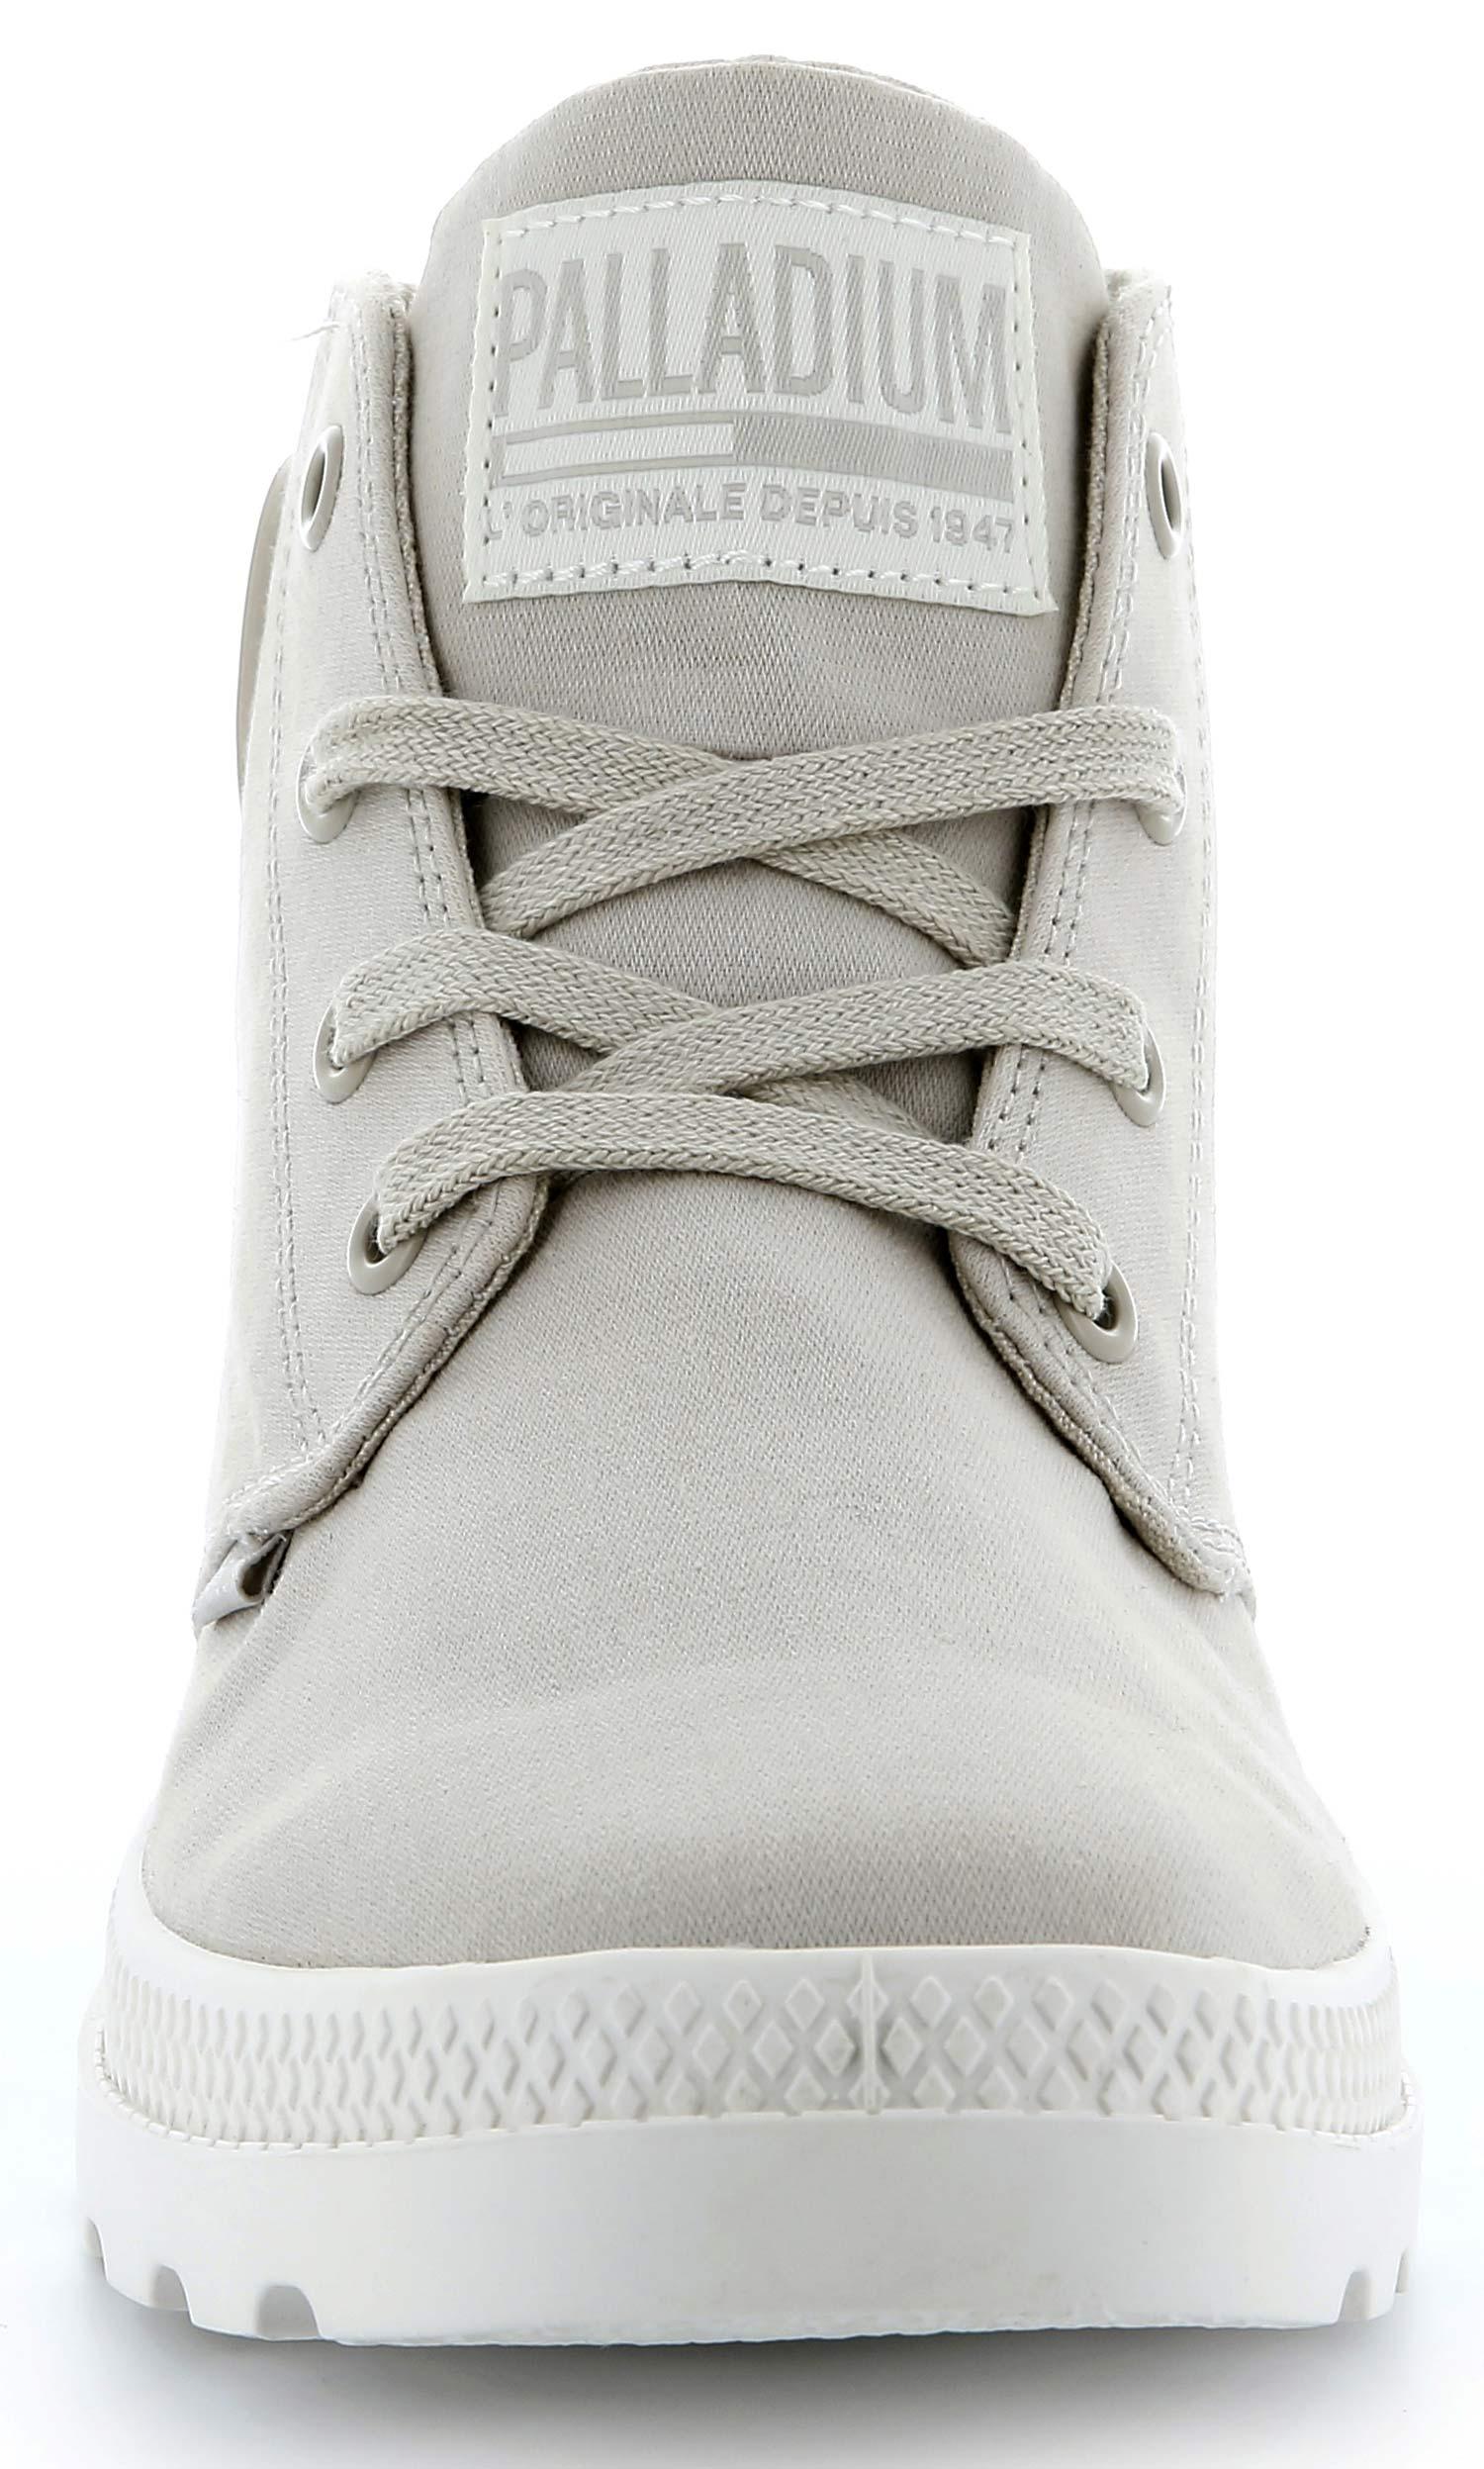 Palladium-Baggy-Free-Botas-mujer-Zapatos-Informales-Botas-95742-058-m-gris-NUEVO